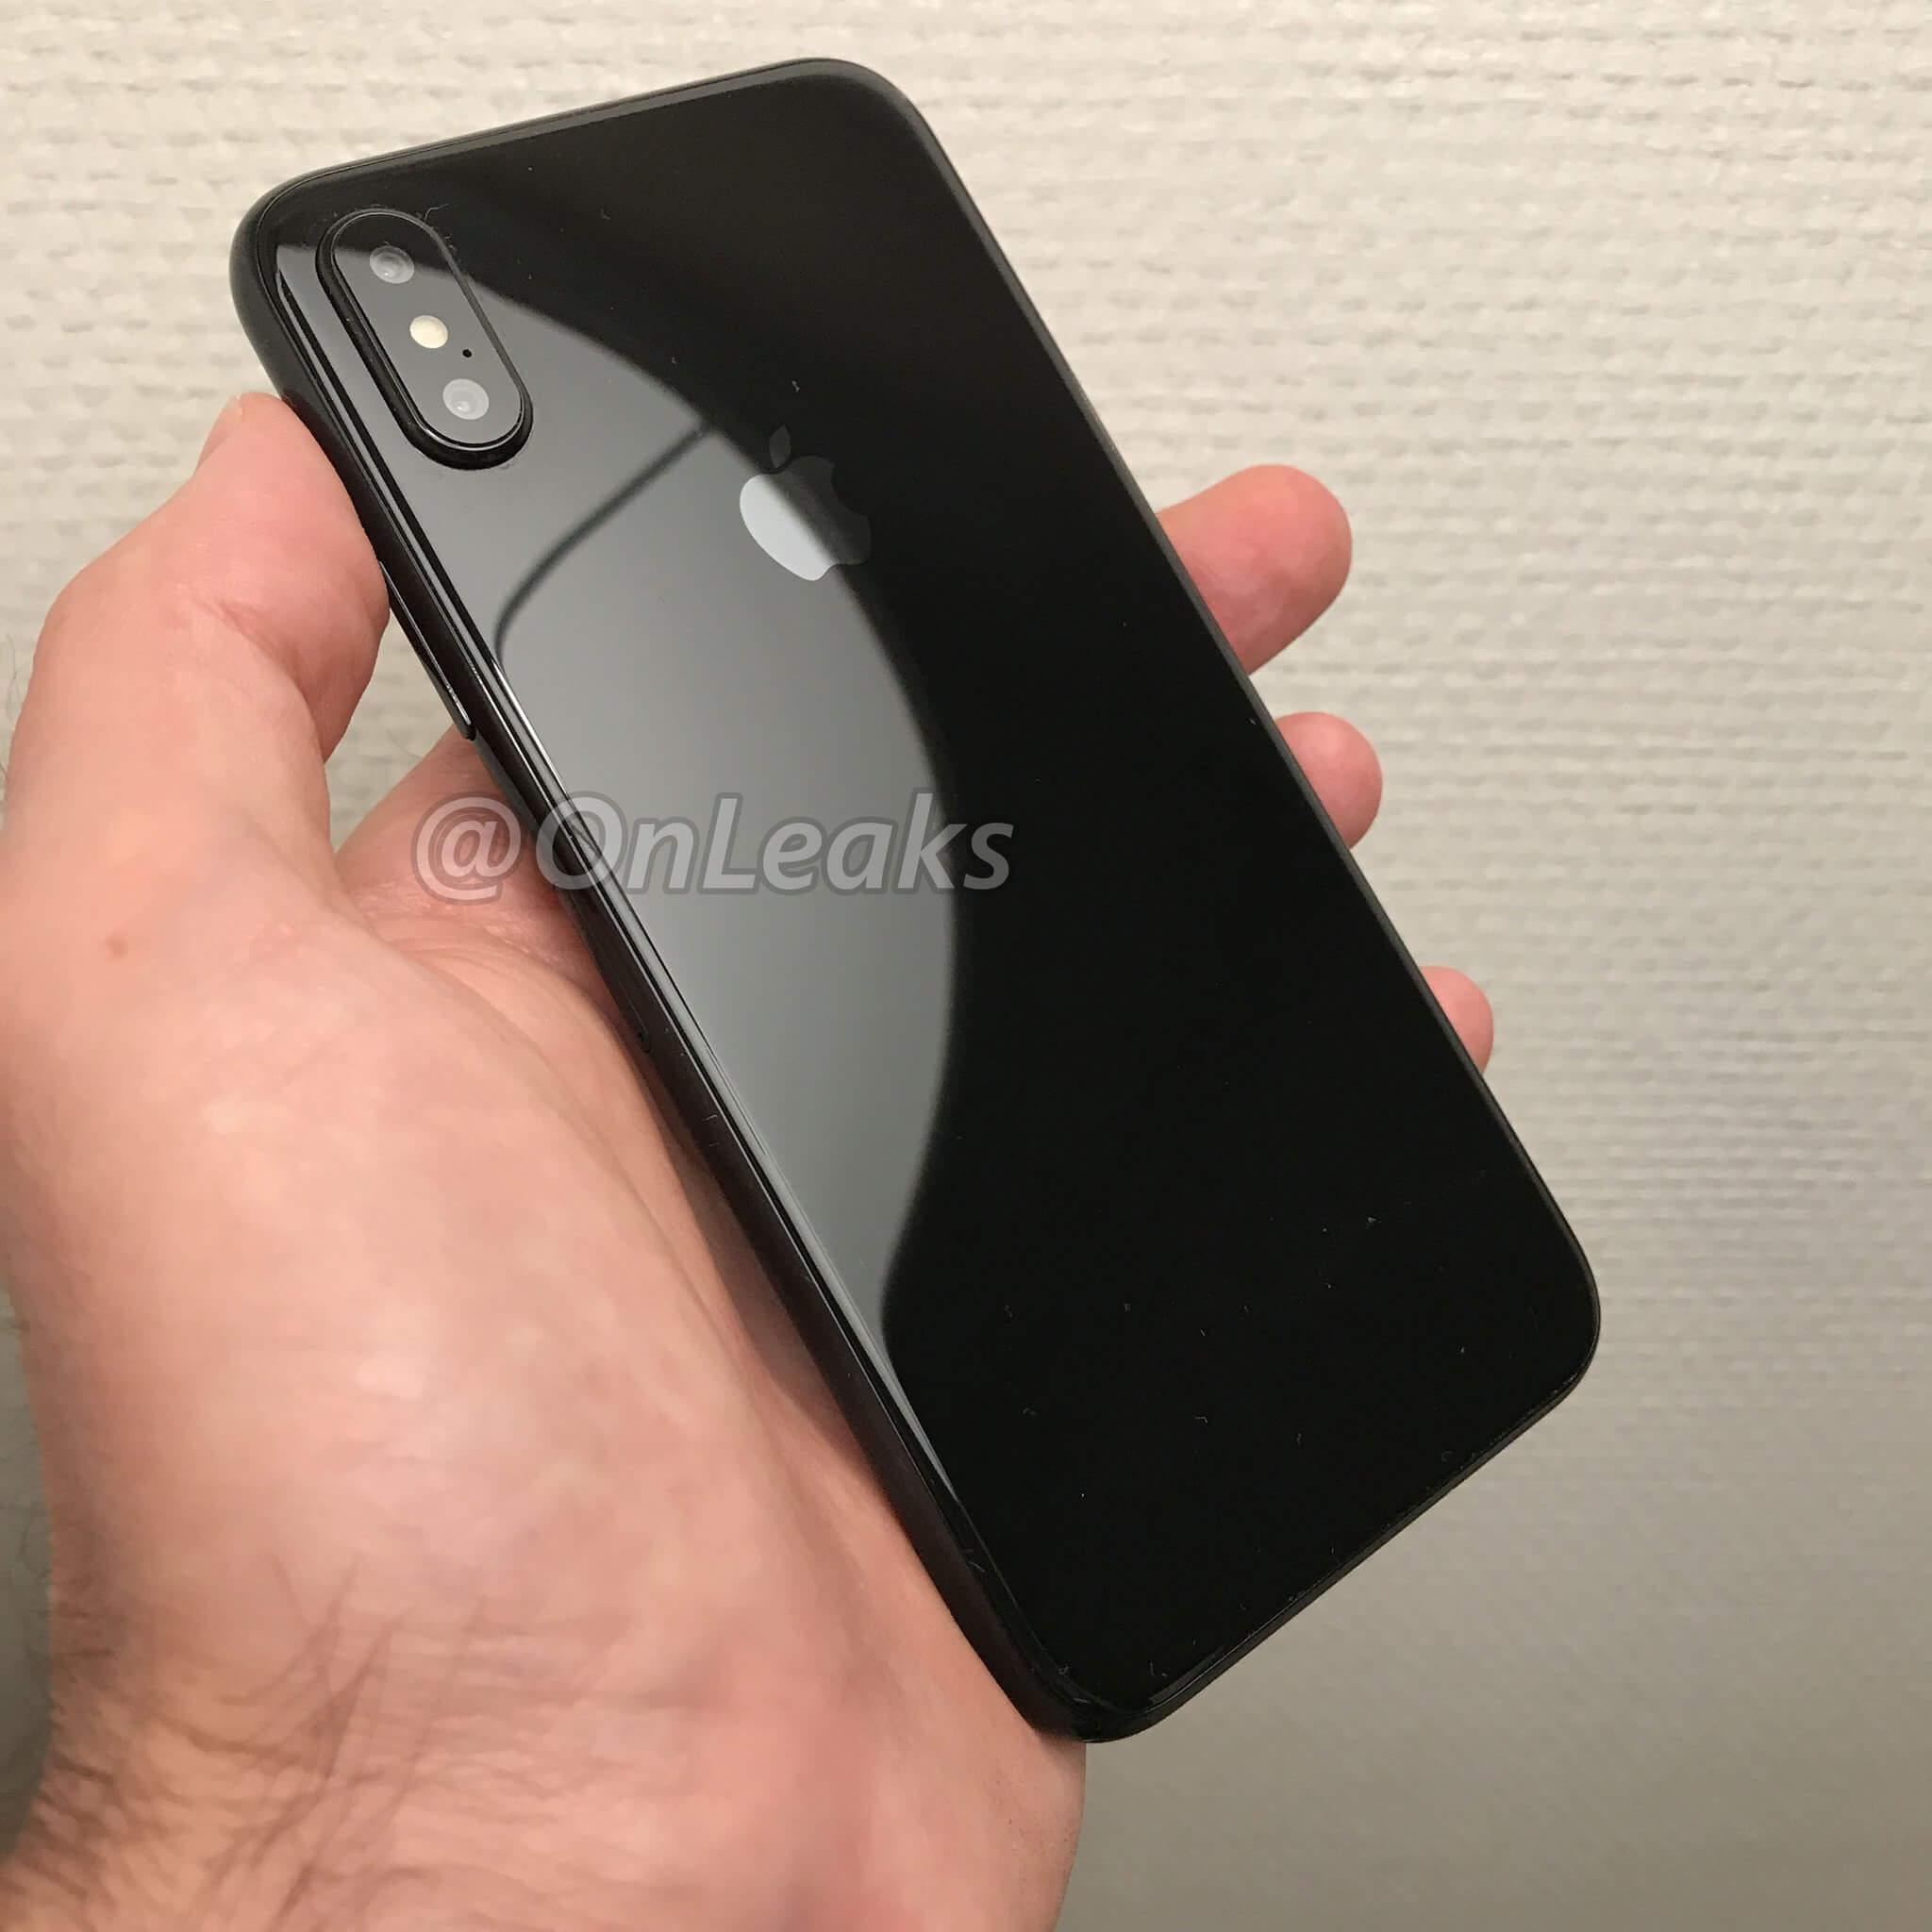 iPhone 8 拿在手上會是怎樣的感覺?用實體模型機給你看